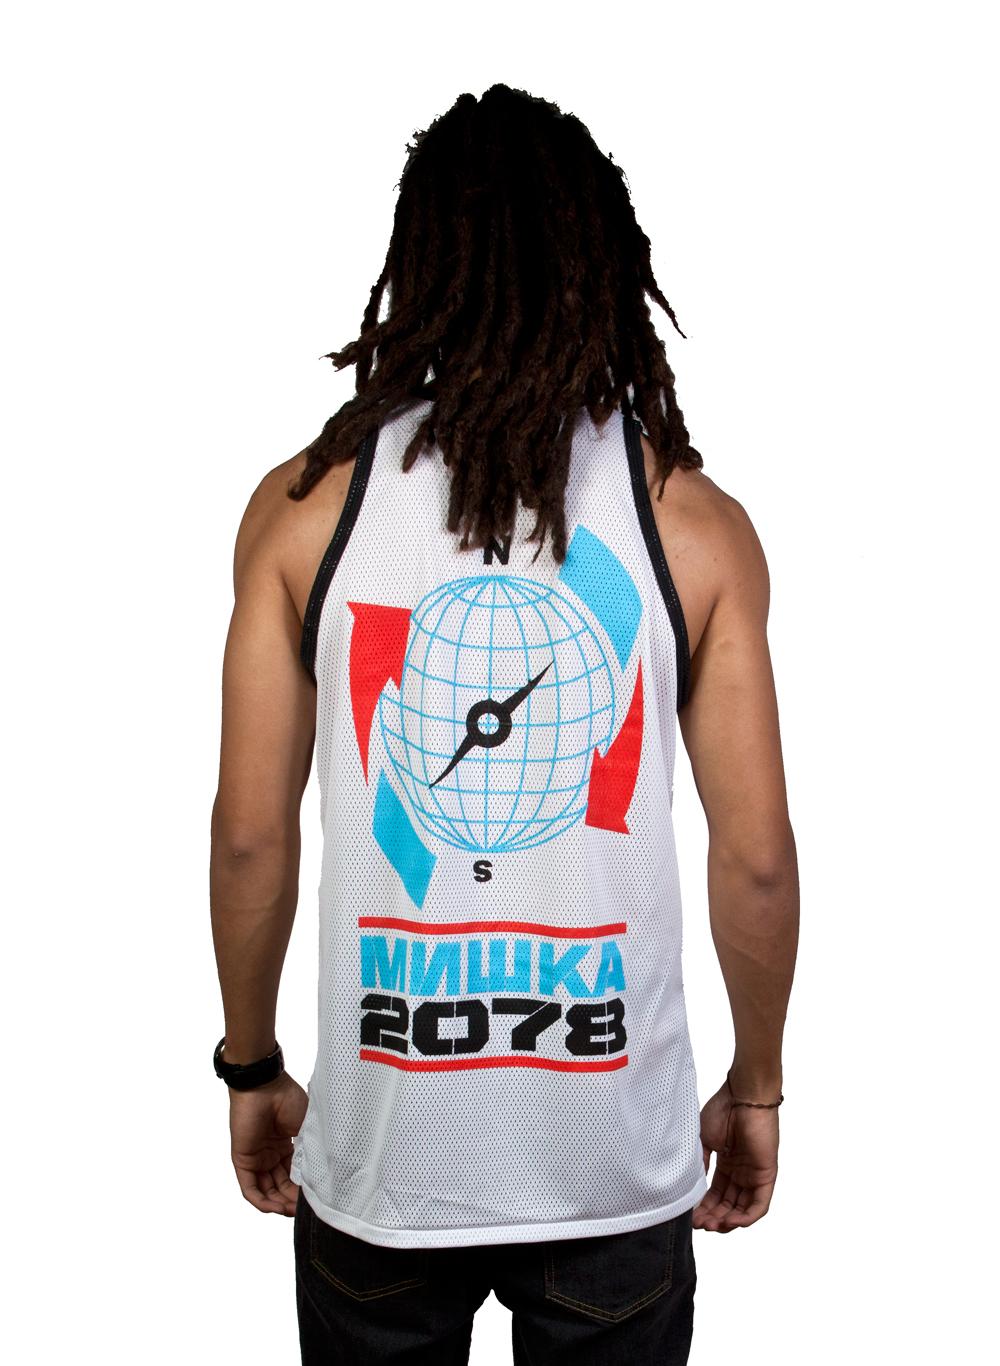 Polar Vortex Basketball Jersey